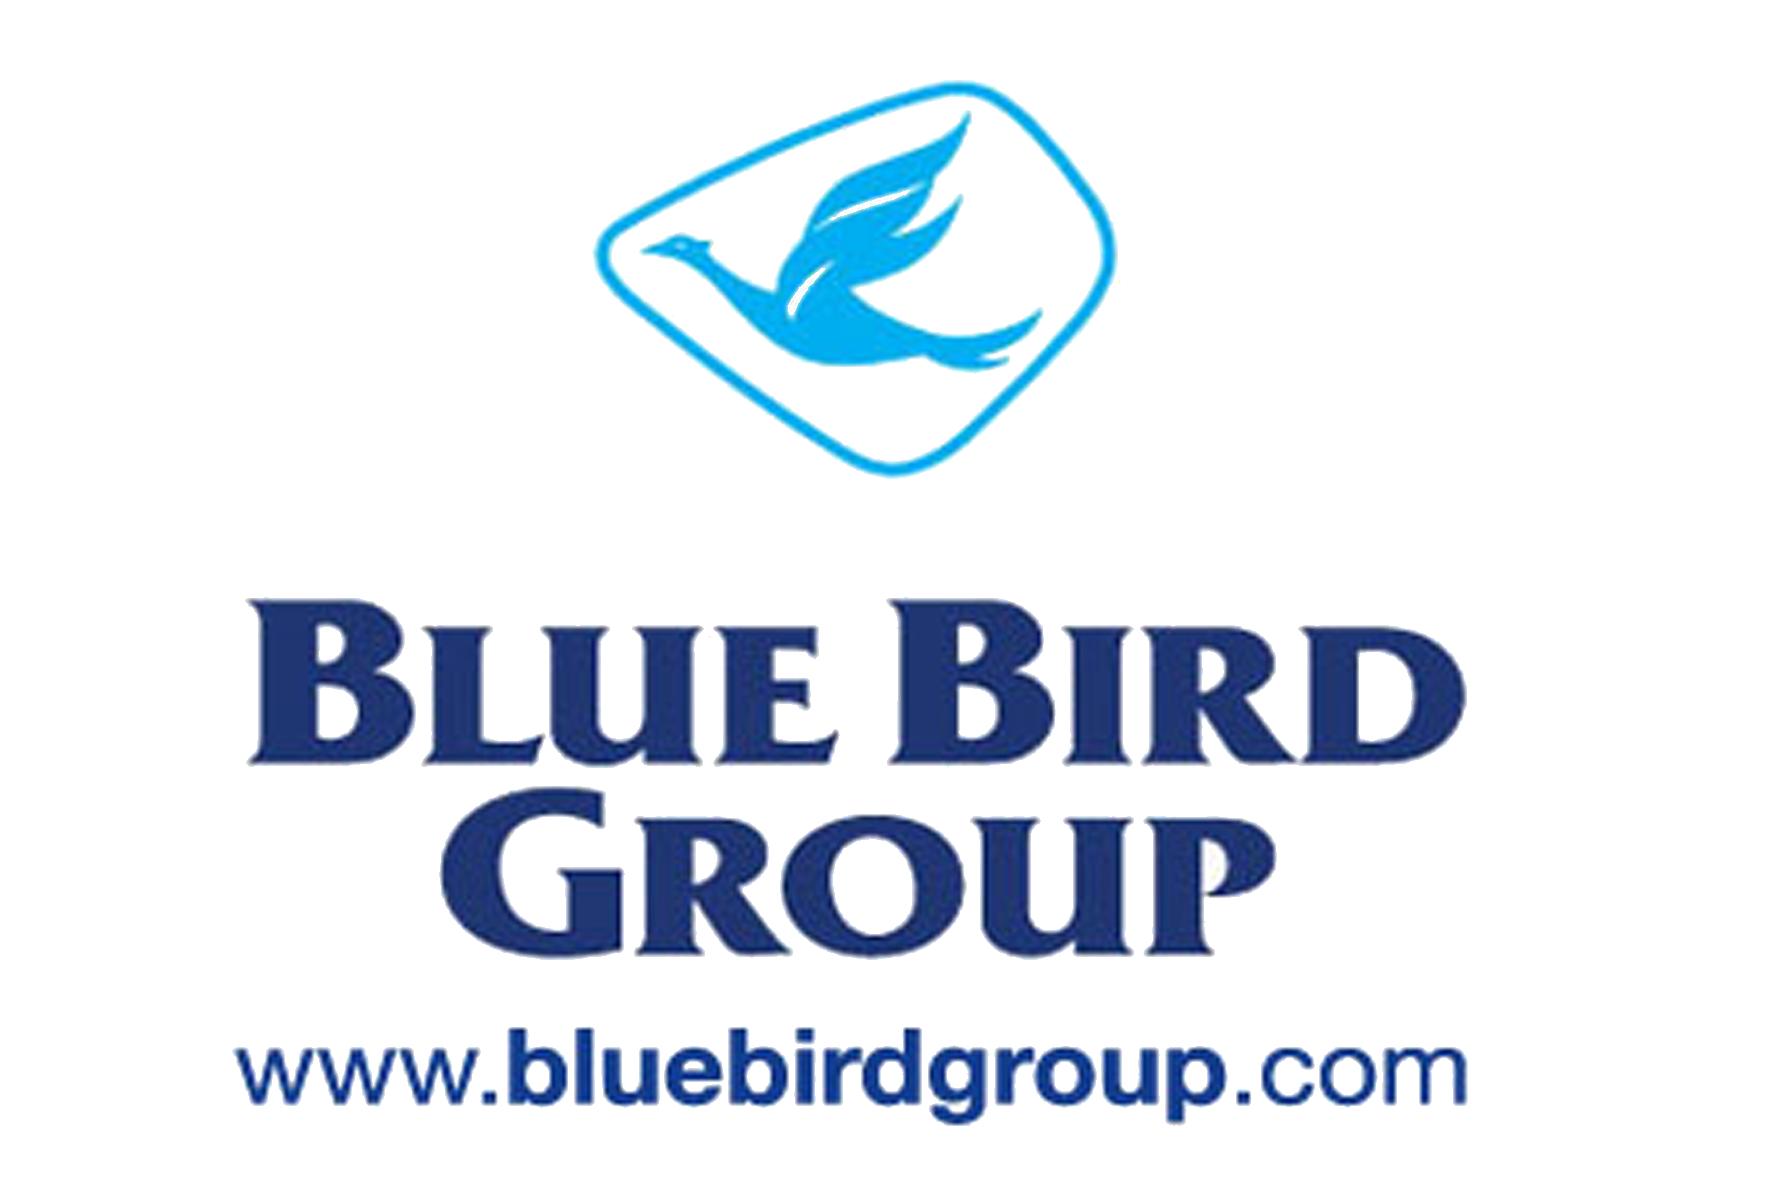 https://ratushima567.files.wordpress.com/2014/02/bluebird-png2.png